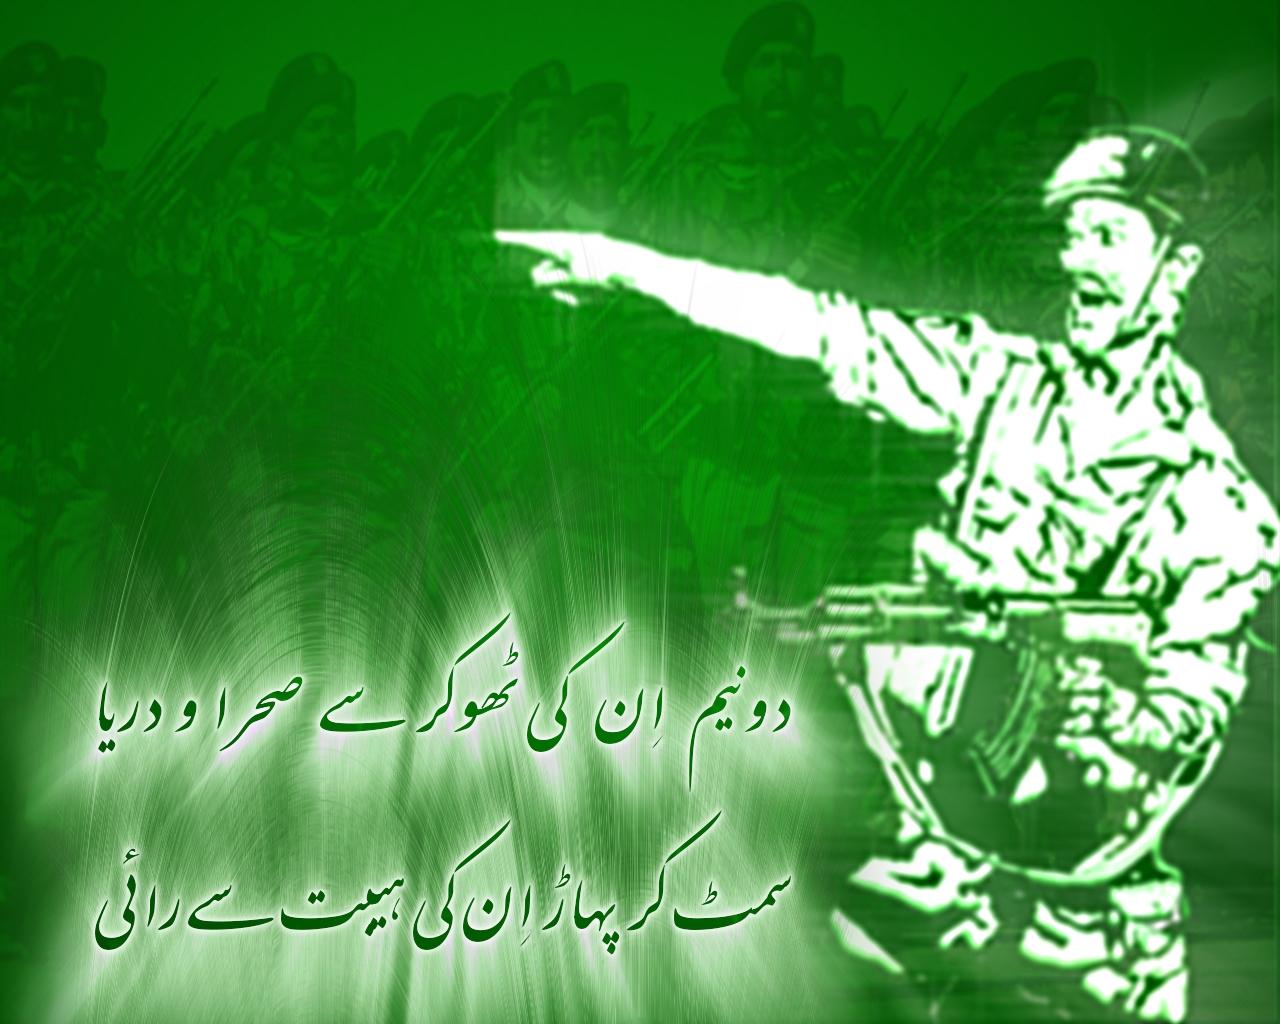 Pakistan Independence Day wallpapers Freelance Developer Blog 1280x1024